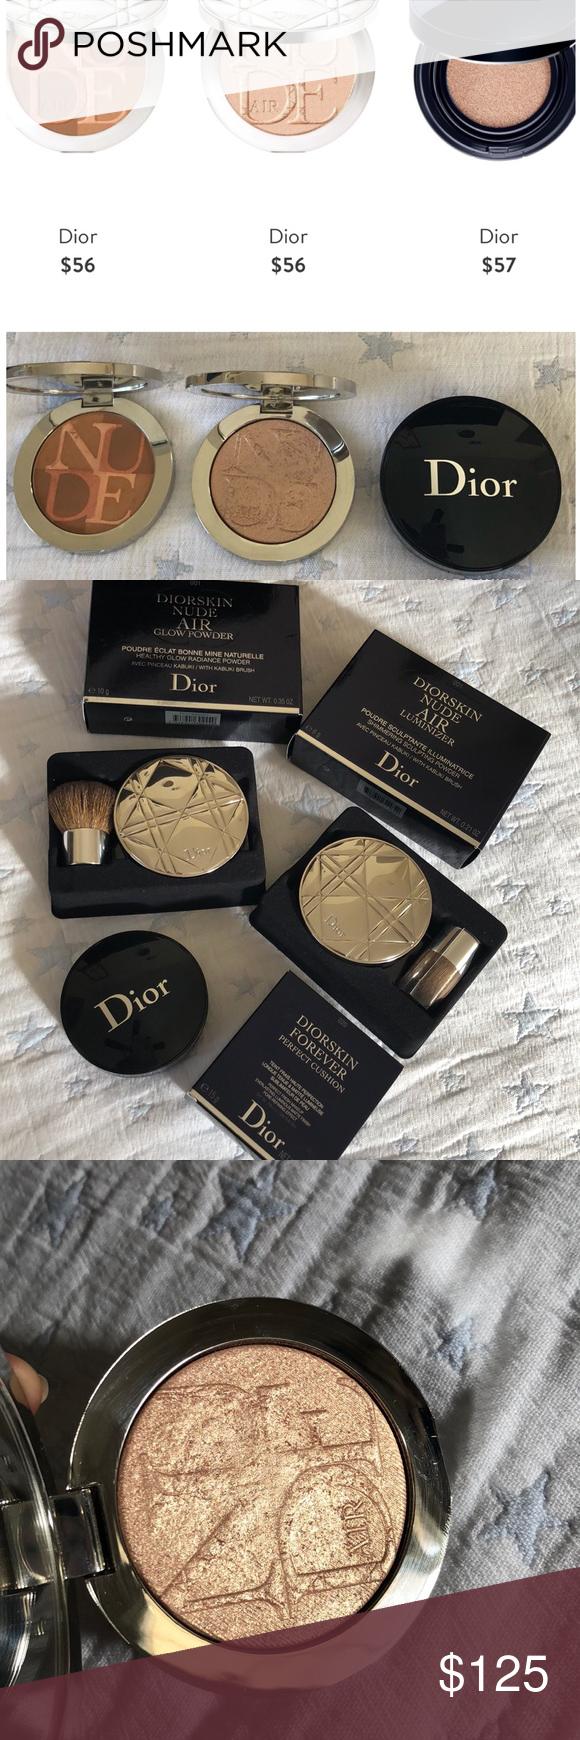 Dior Skin Forever Perfect Cushion Foundation 20 Diorskin